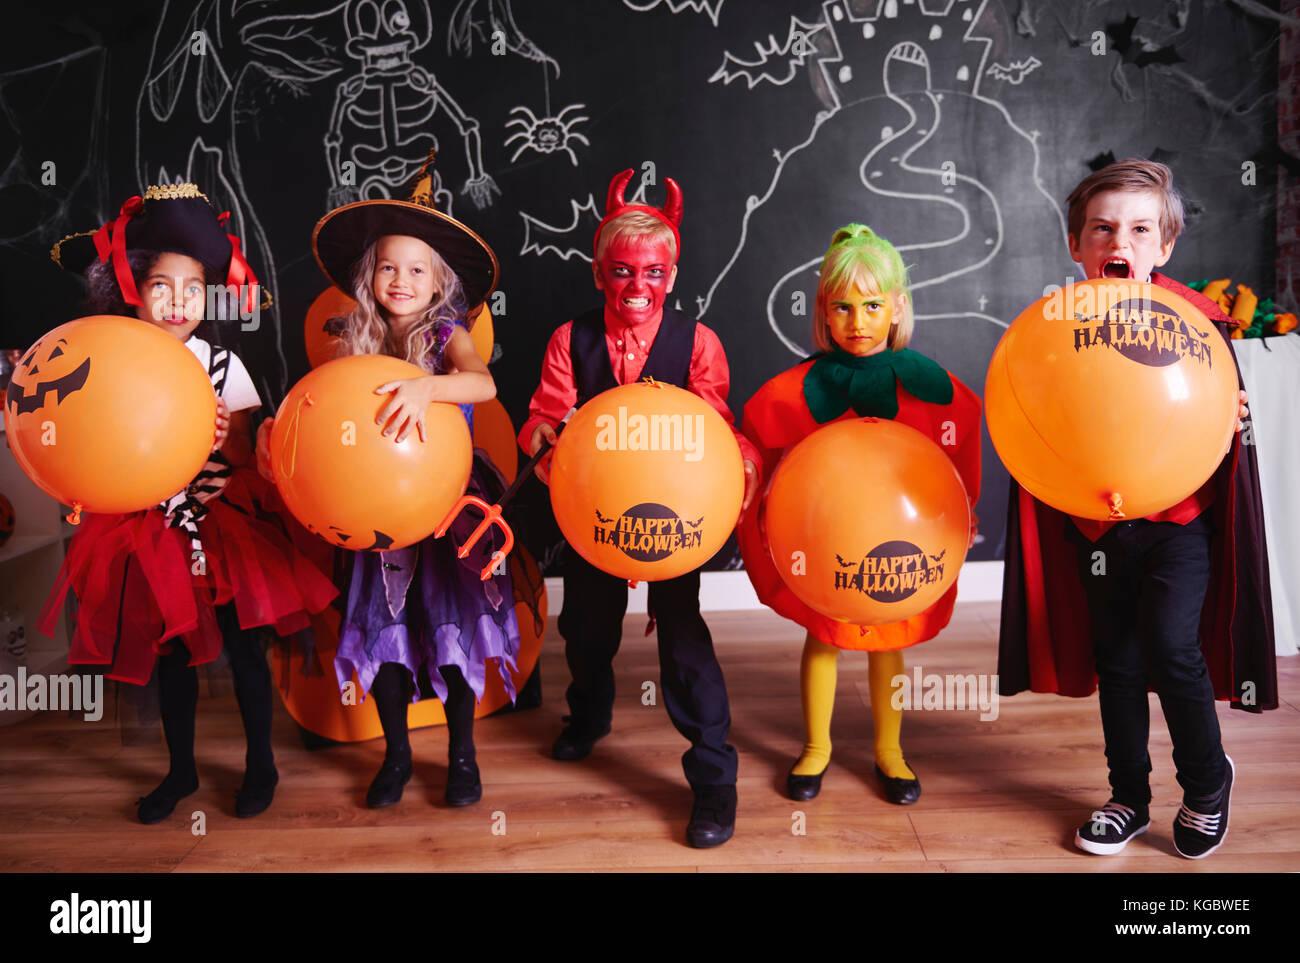 Les enfants en costume standing in a row et posing Photo Stock